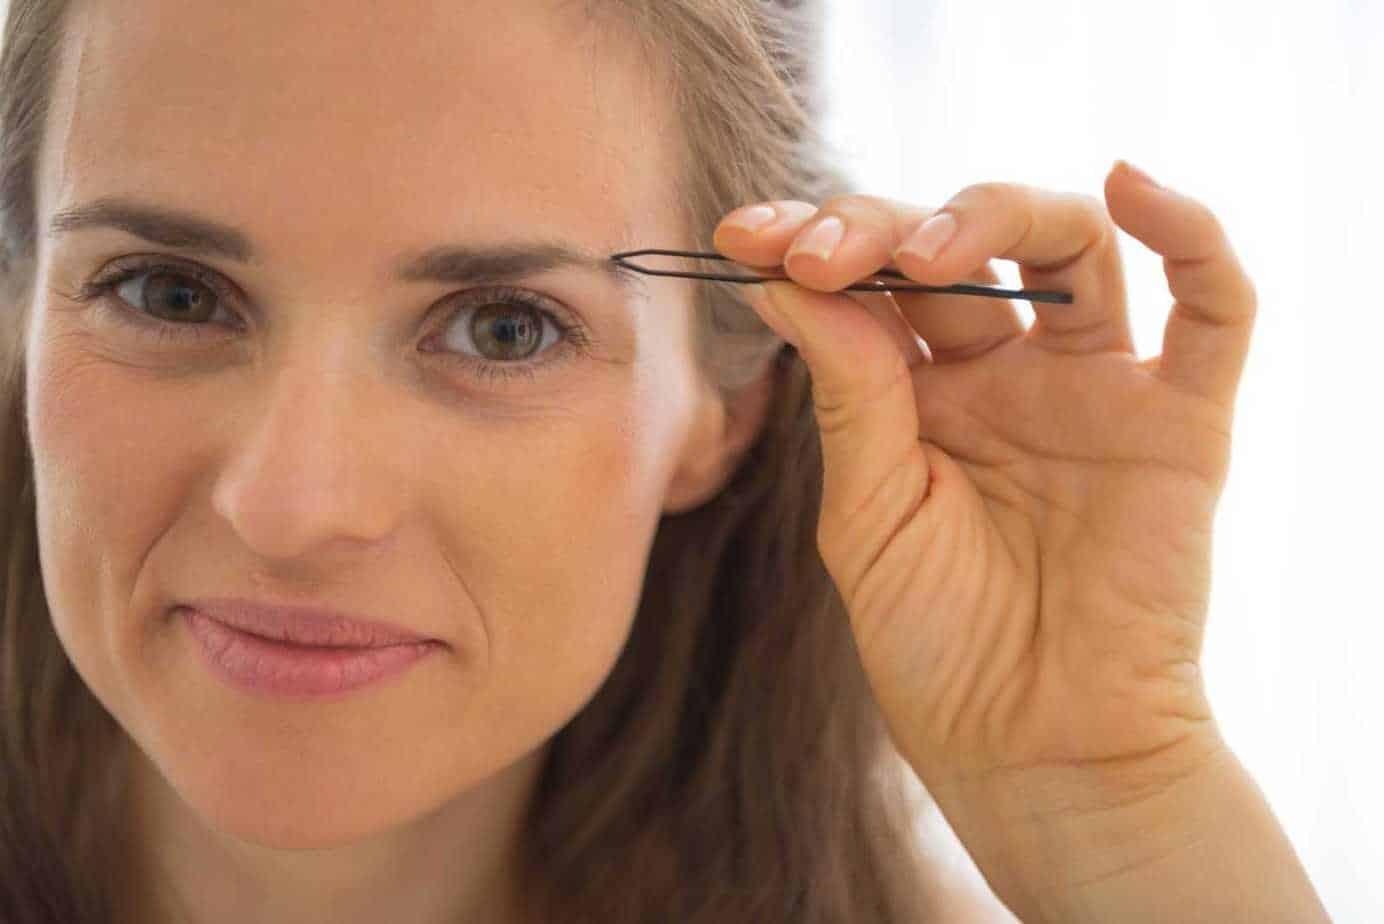 Restoring Over Plucked Eyebrows